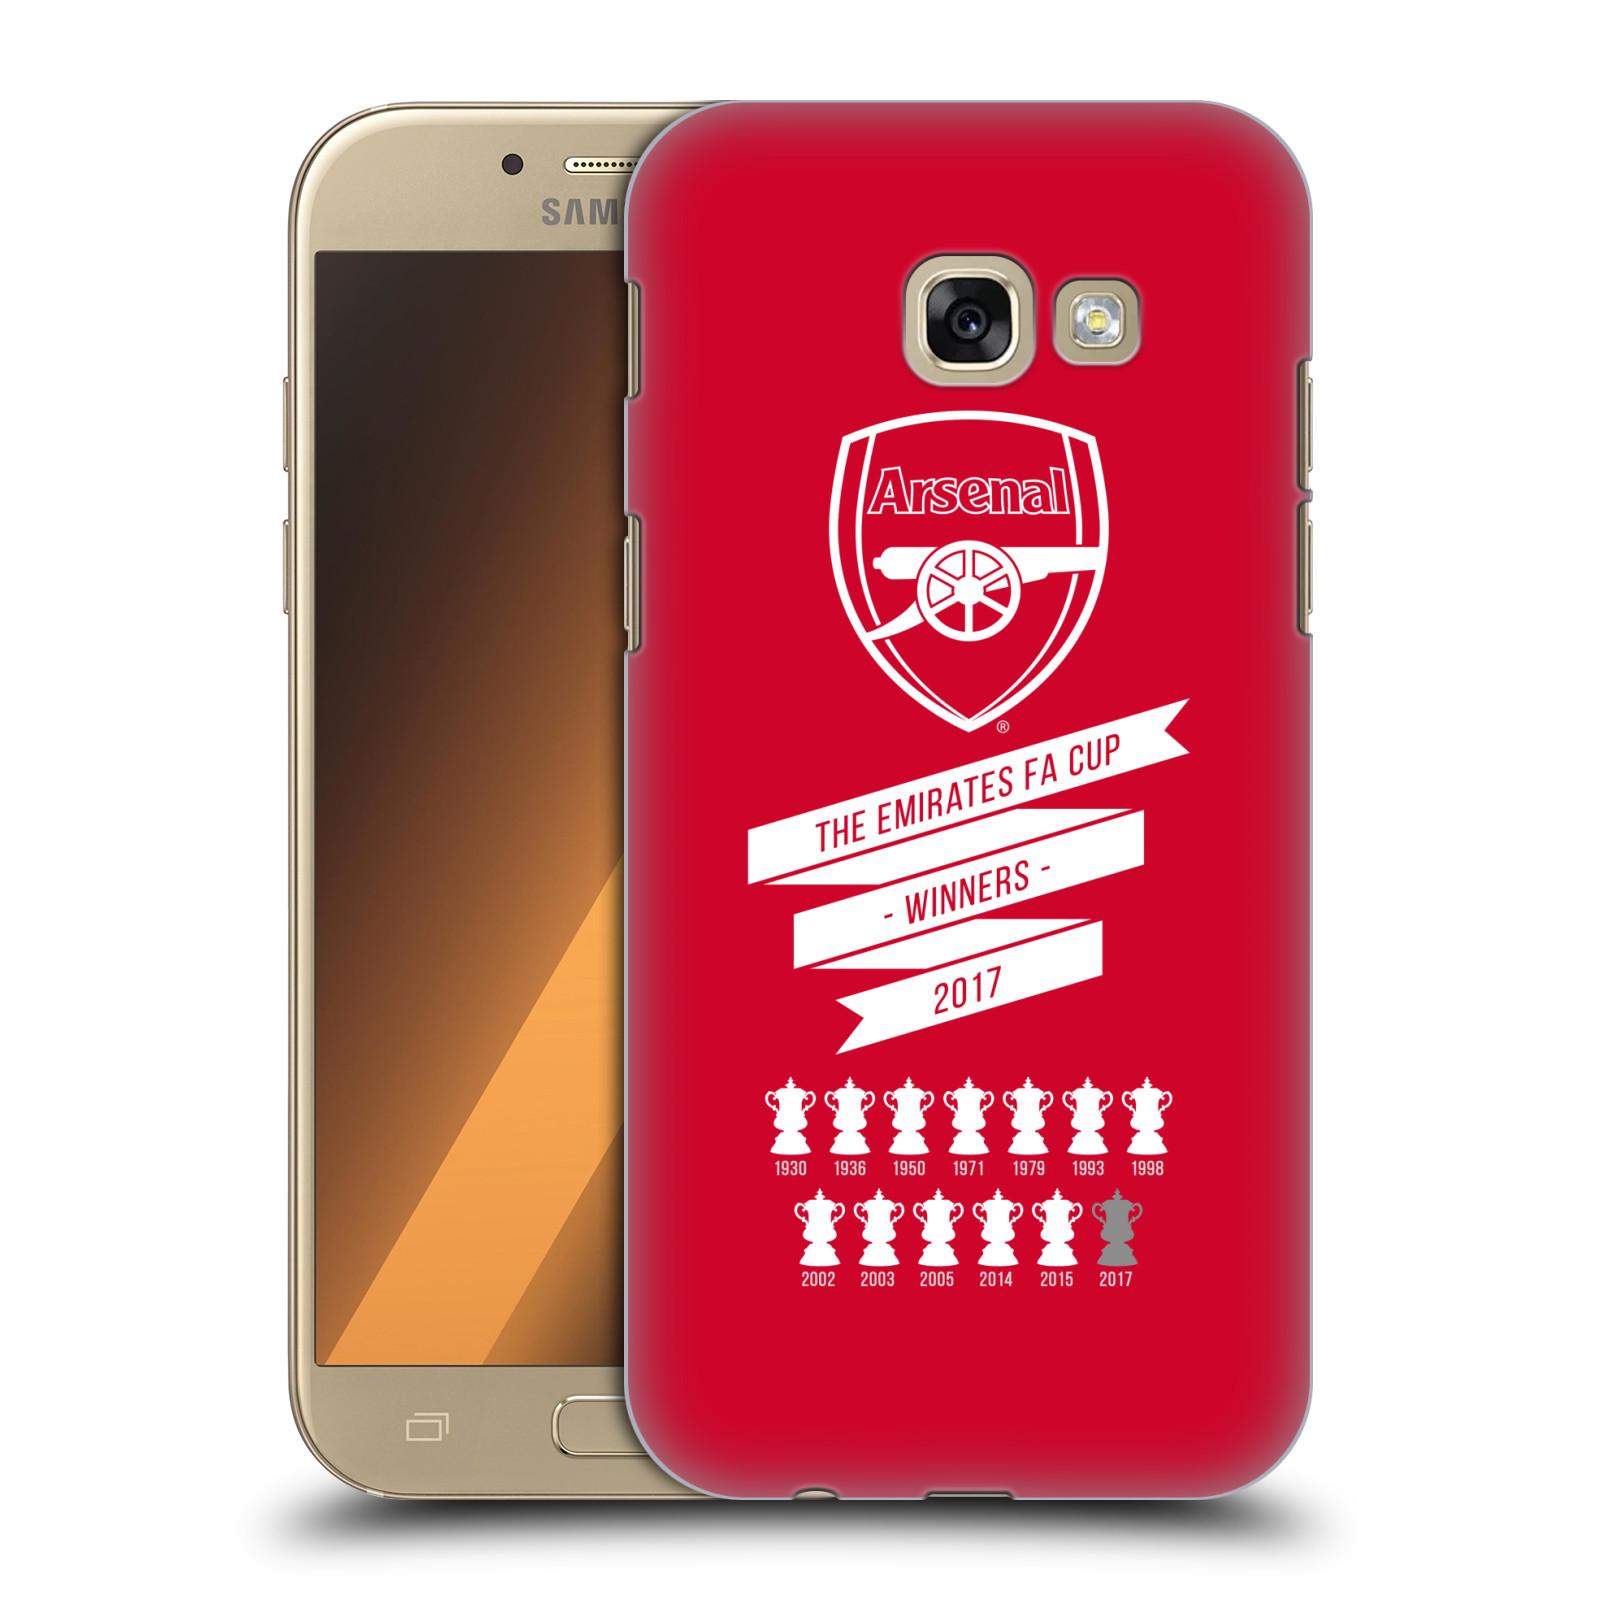 Plastové pouzdro na mobil Samsung Galaxy A5 (2017) - Head Case - Arsenal FC - 13 Wins